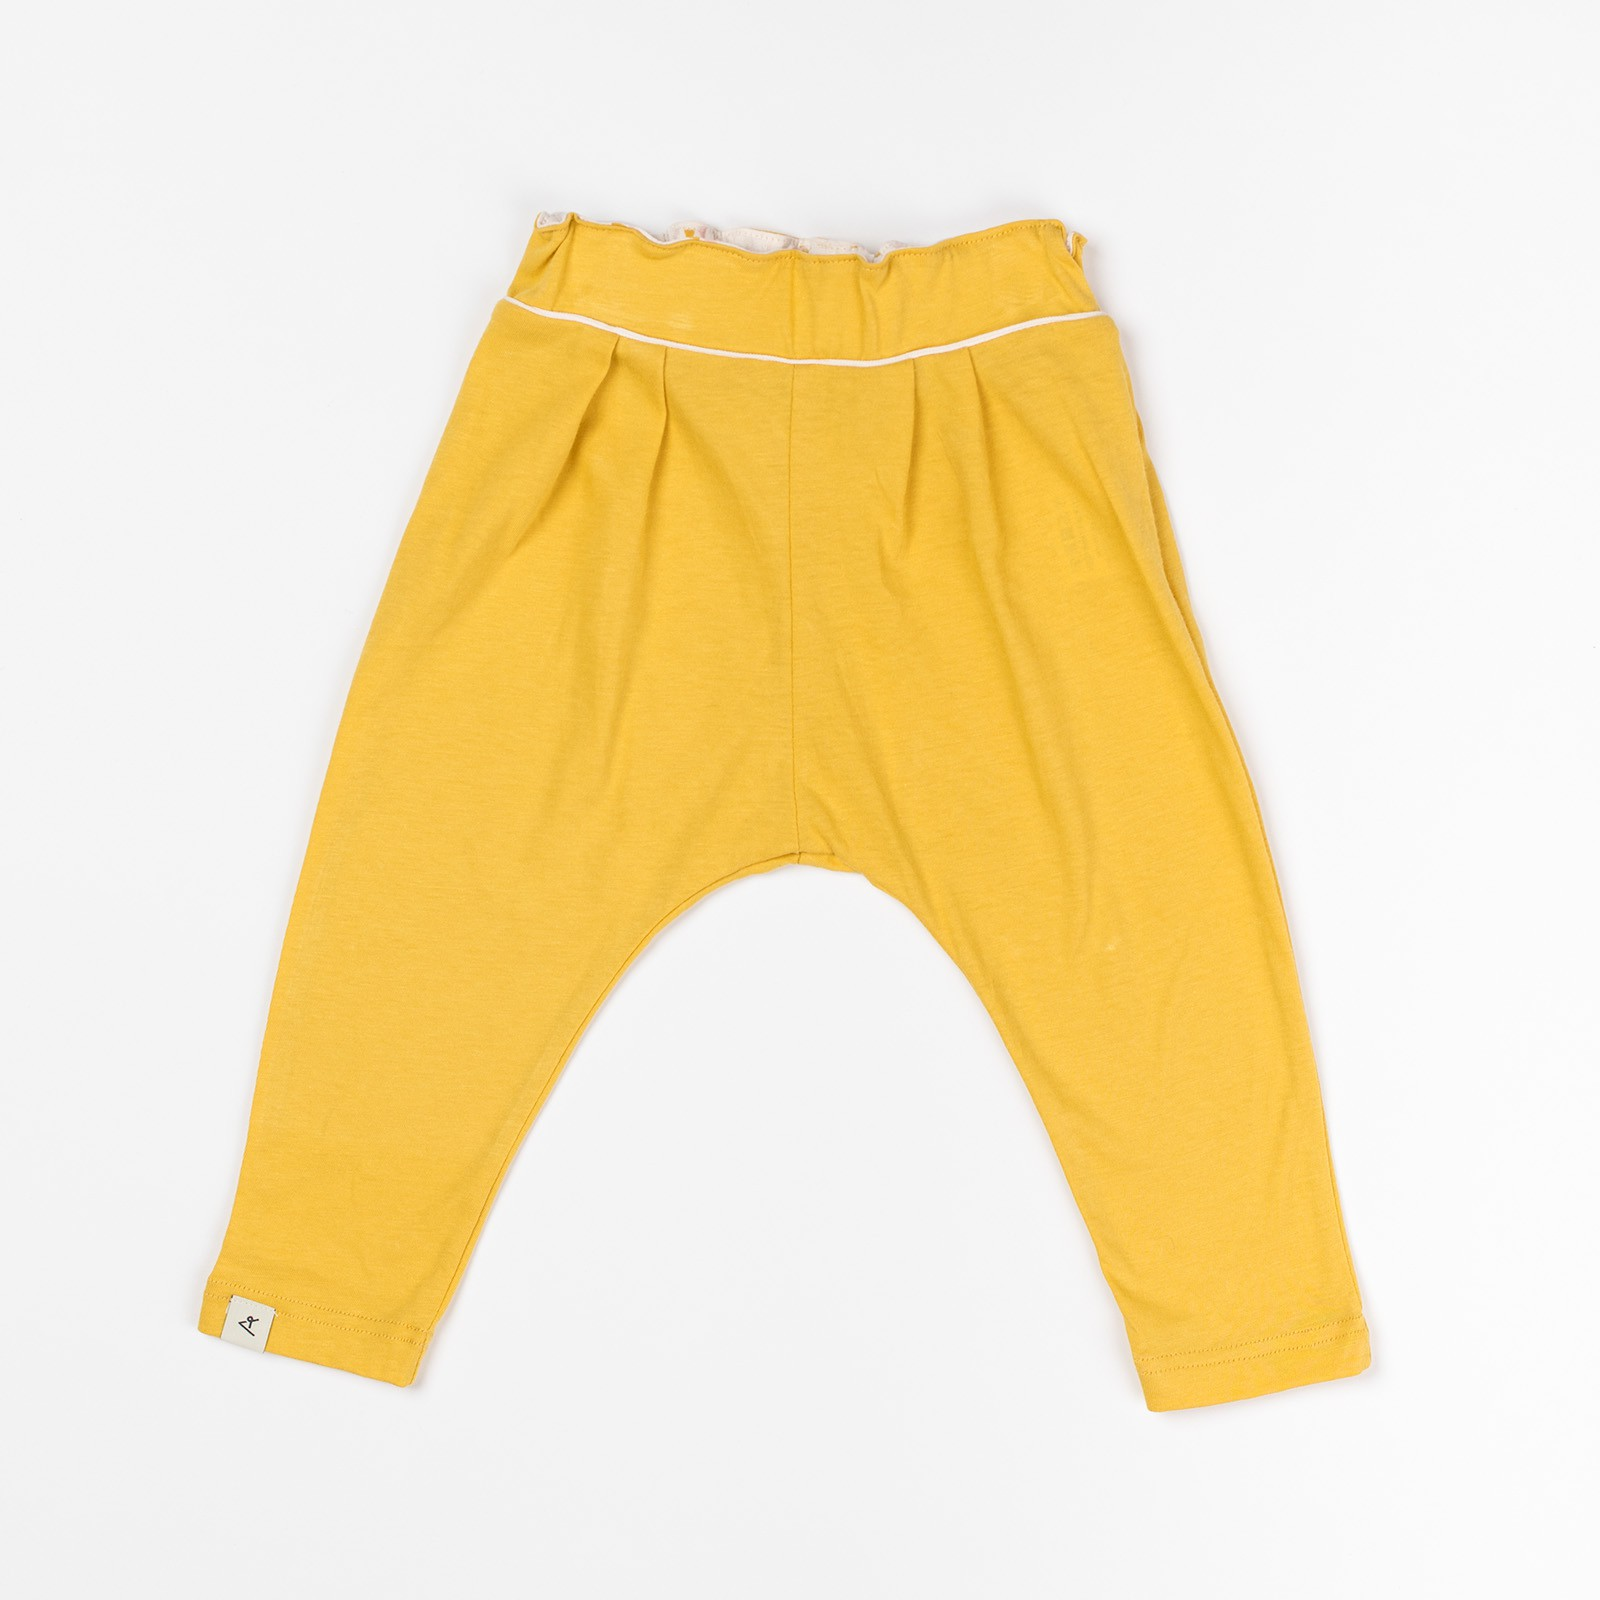 Hubbie Baby pants